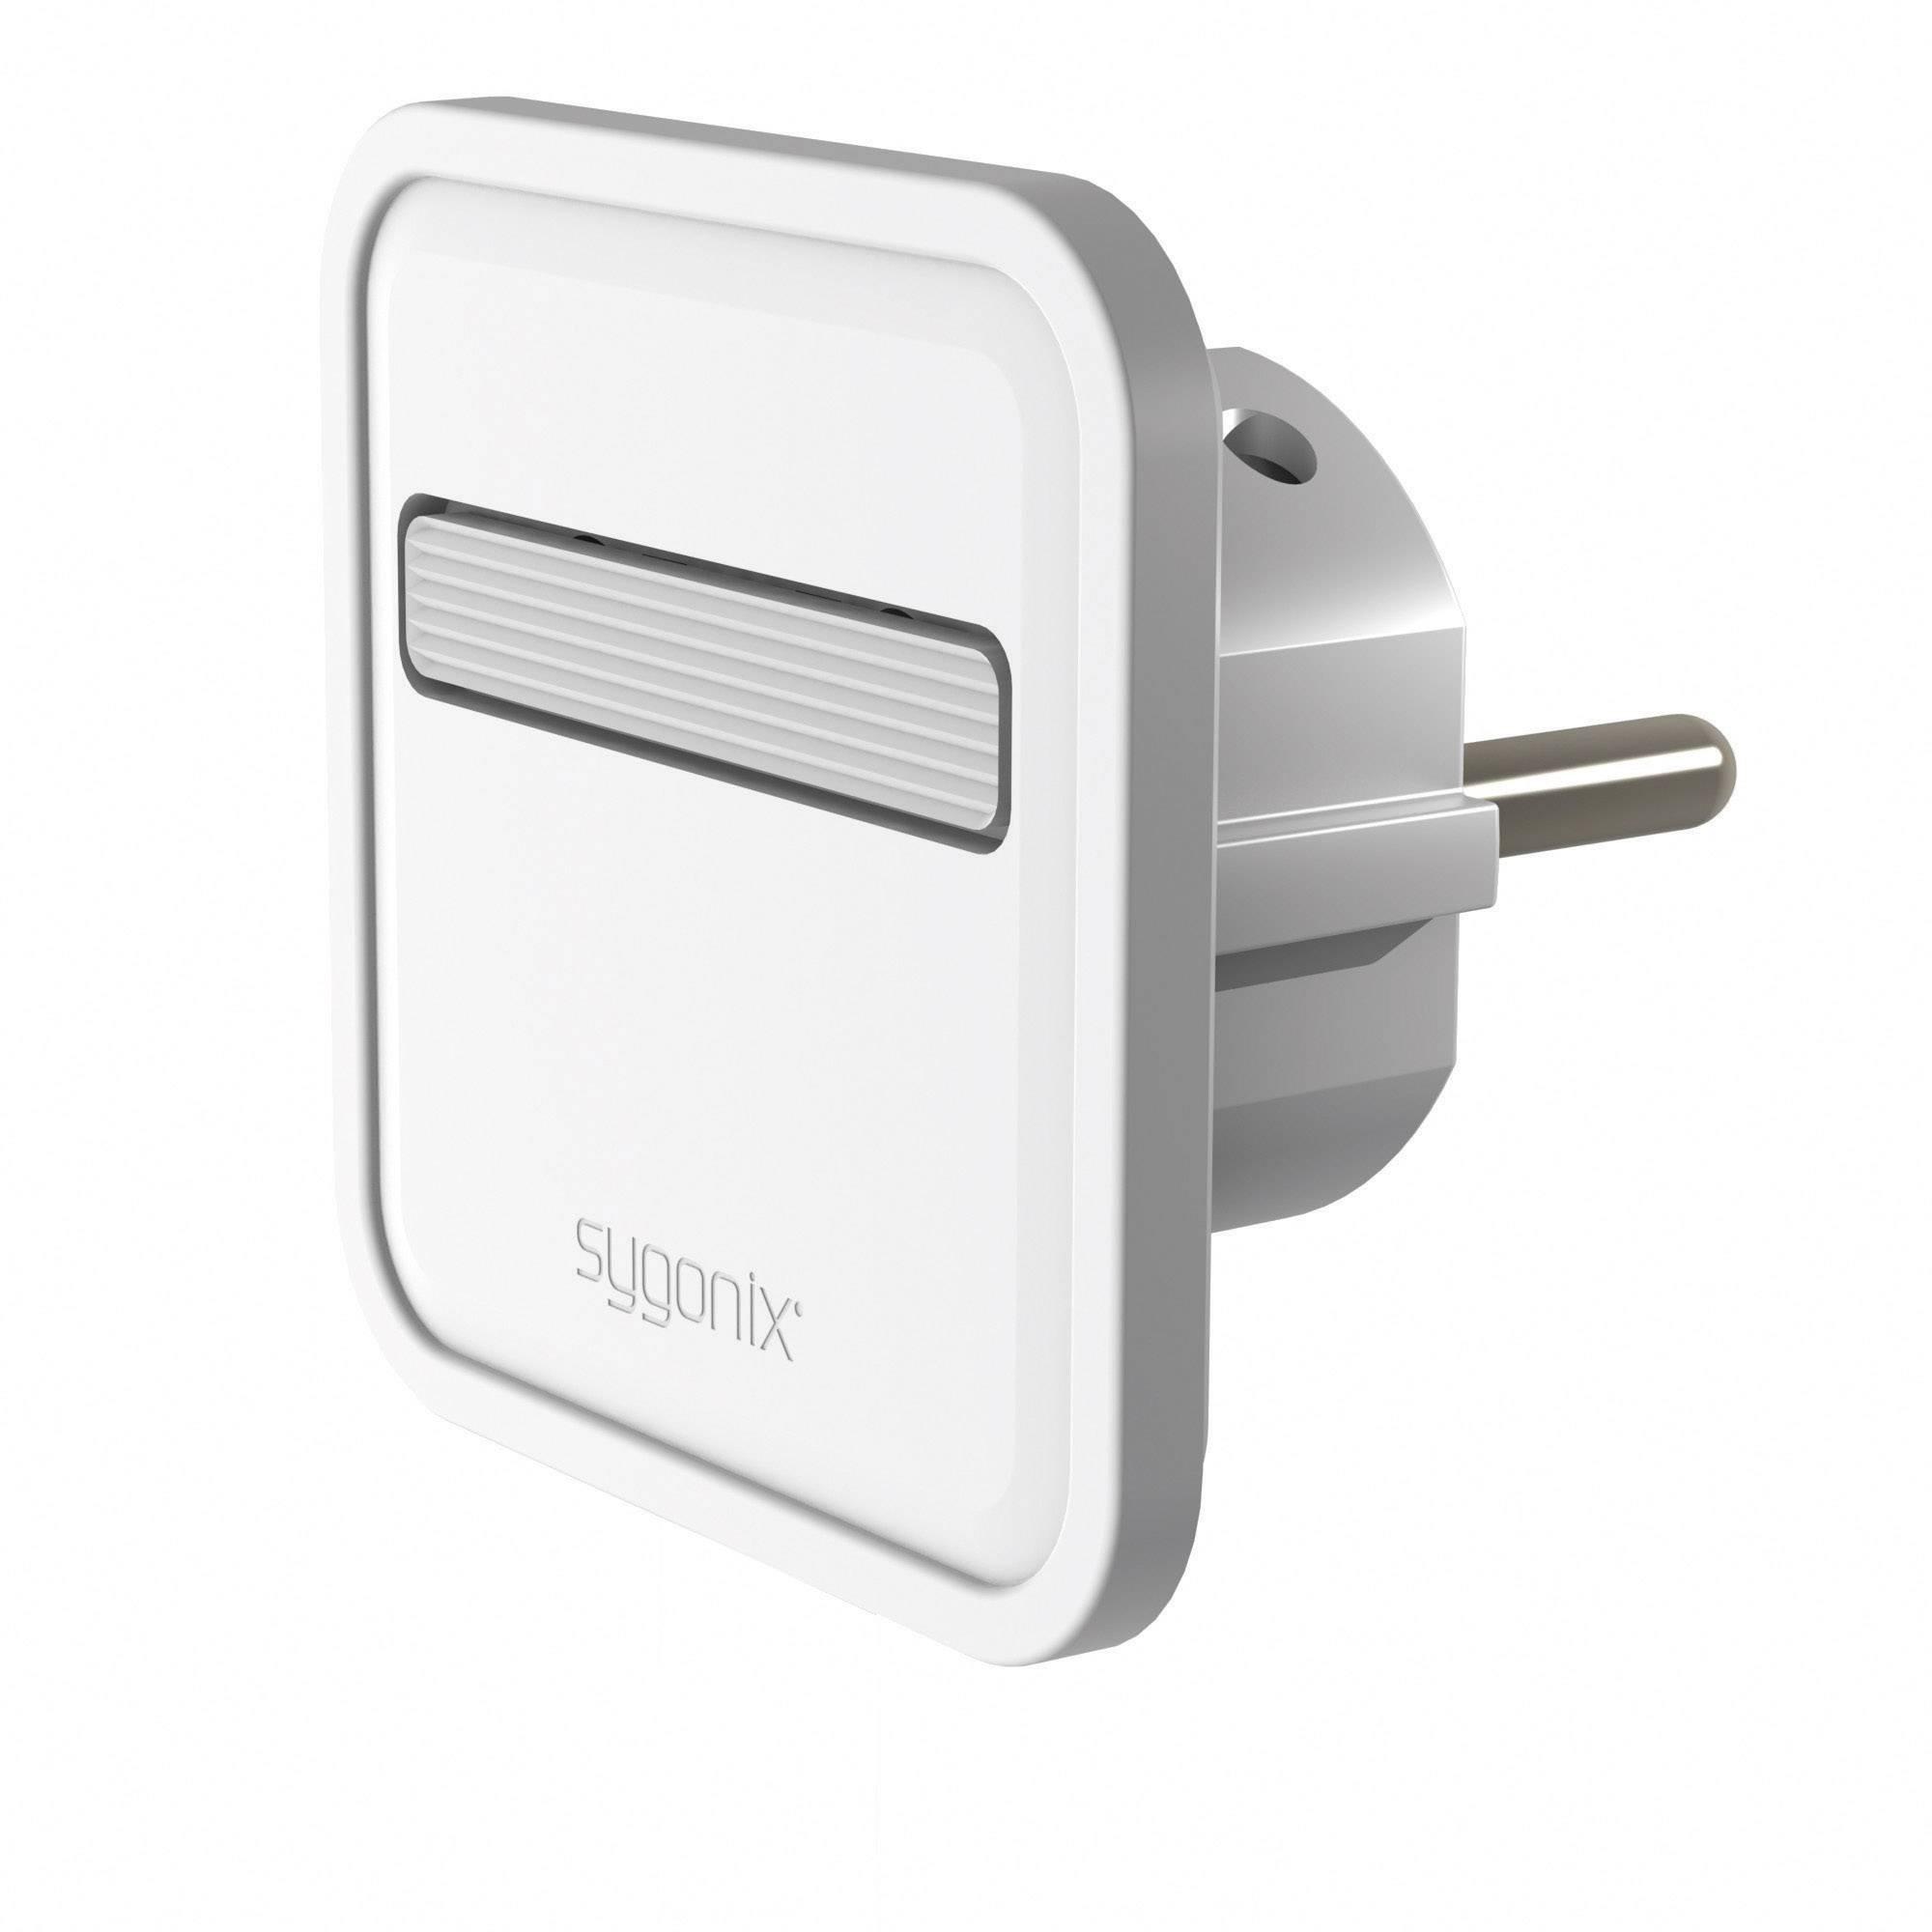 Moderne Fladstik EVOline® Plug hvid EVOline EVOline Plug 1510.0000.0300 BP87